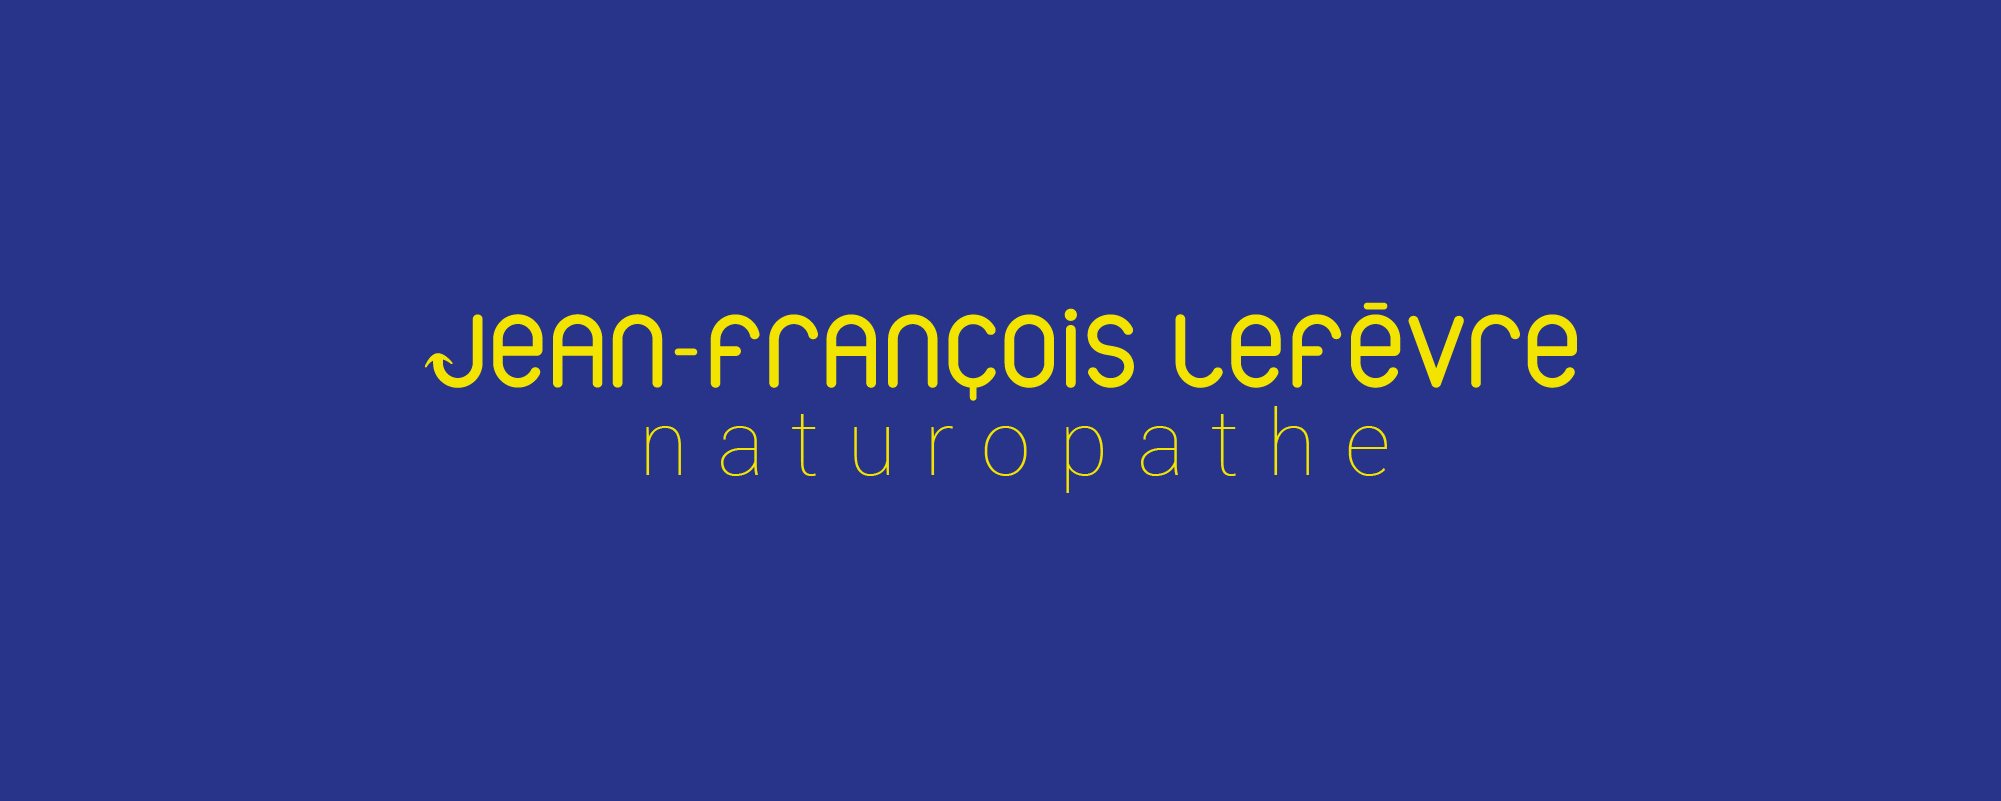 JEAN FRANCOIS LEFEVRE – NATUROPATHE LOGO